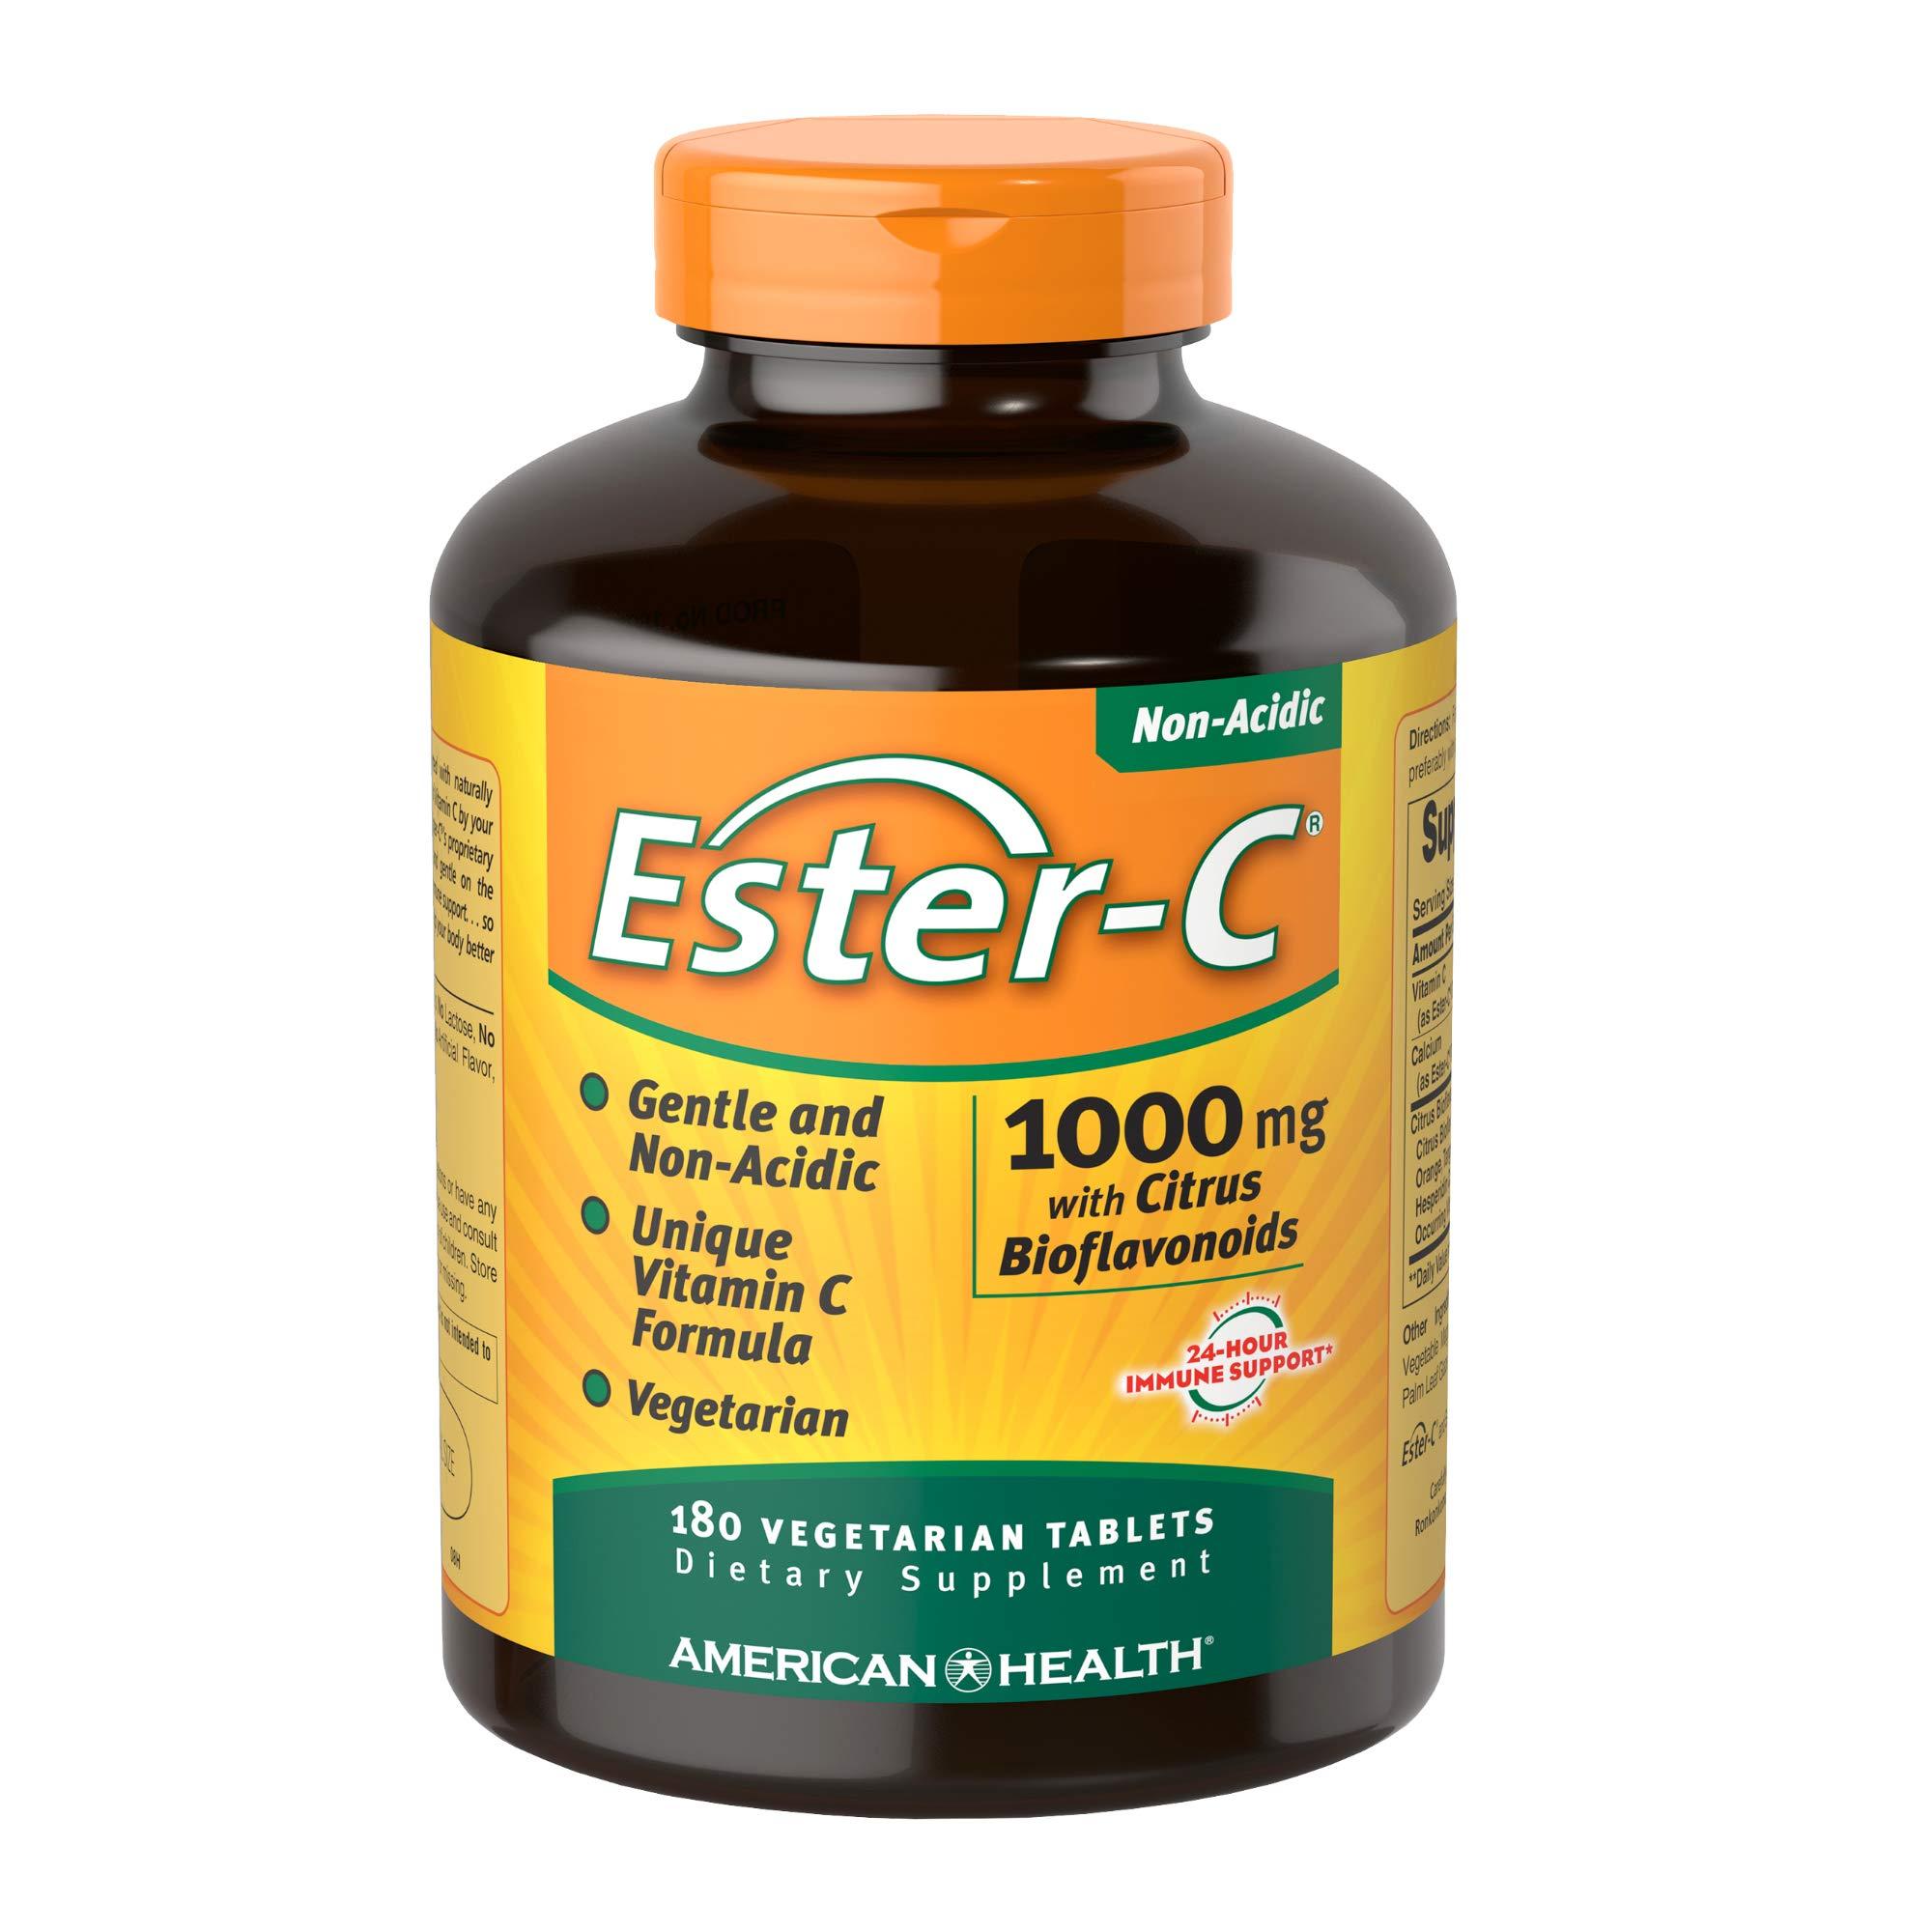 American Health Ester-C with Citrus Bioflavonoids Veg Tablets - 24-Hour Immune Support, Gentle On Stomach, Non-Acidic Vitamin C - Non-GMO, Gluten-Free, Vegan - 1000 mg, 180 Count, 180 Servings